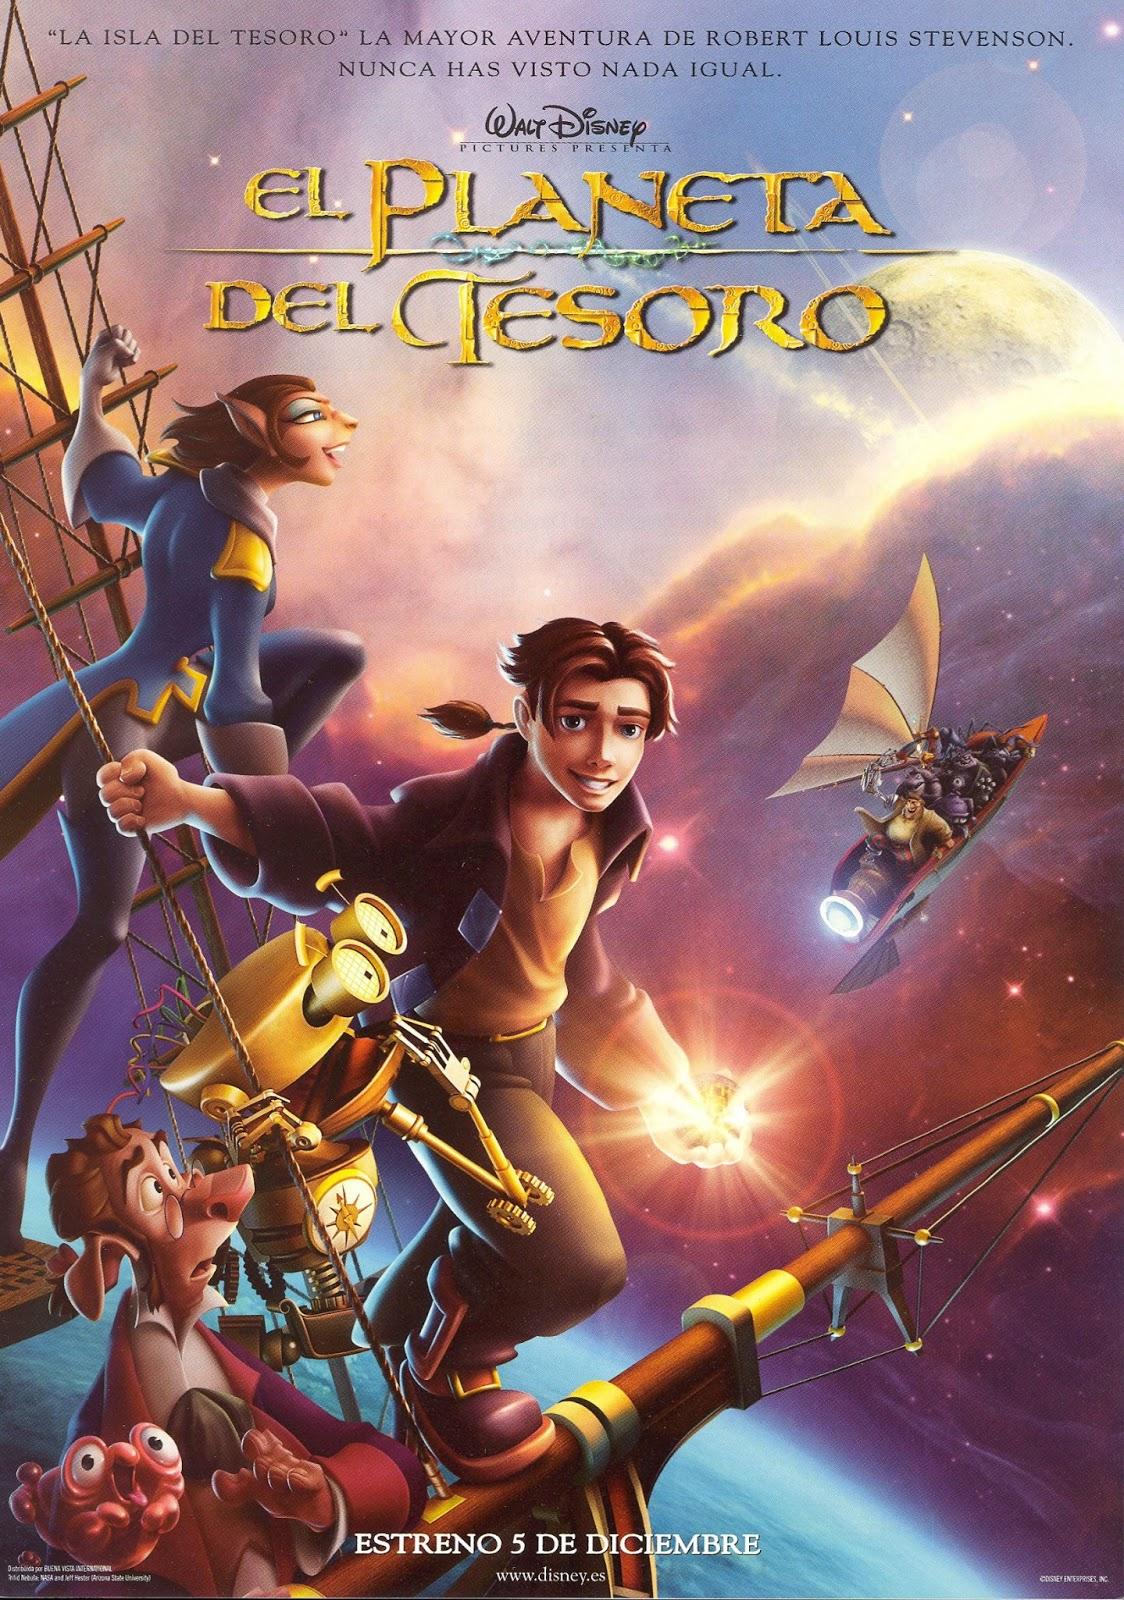 El planeta del tesoro (2002)